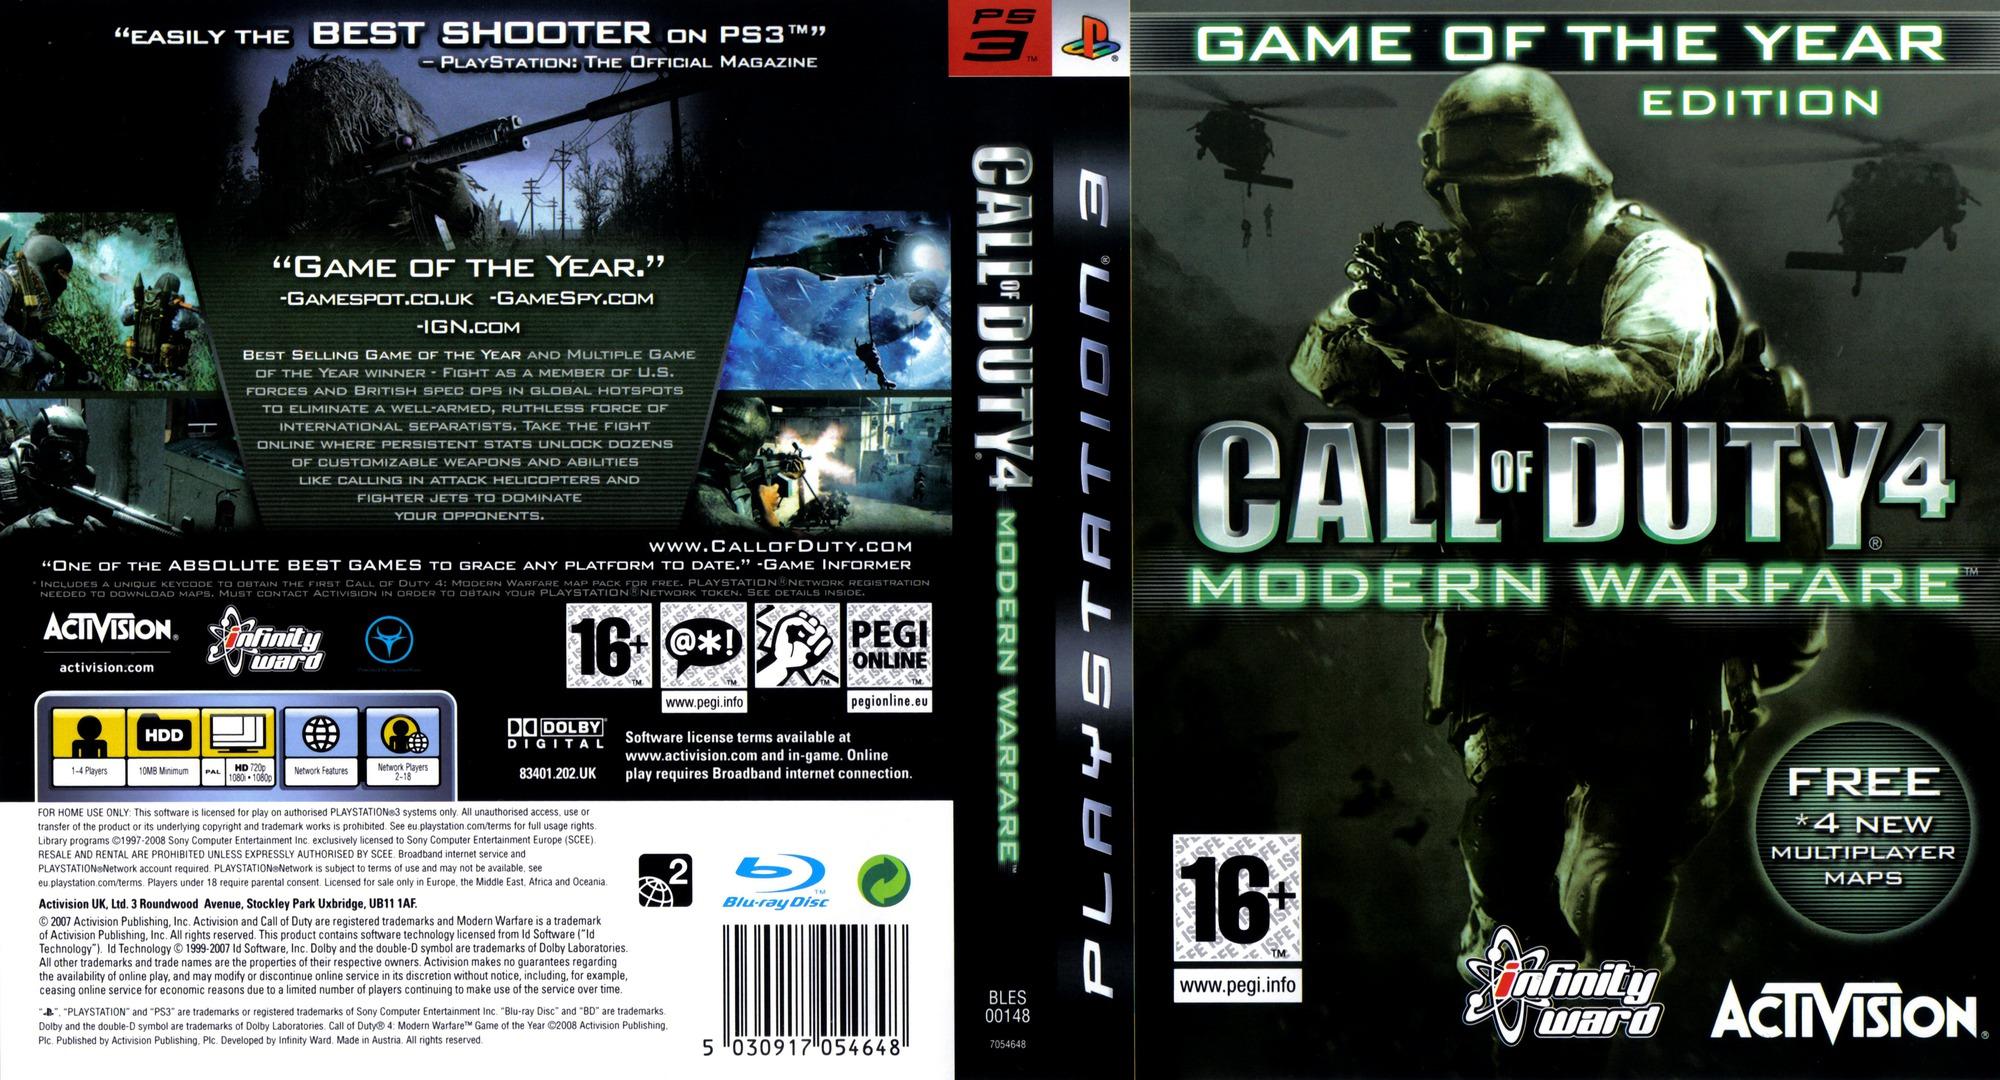 Call of duty 4 multiplayer beta hands-on gamespot.